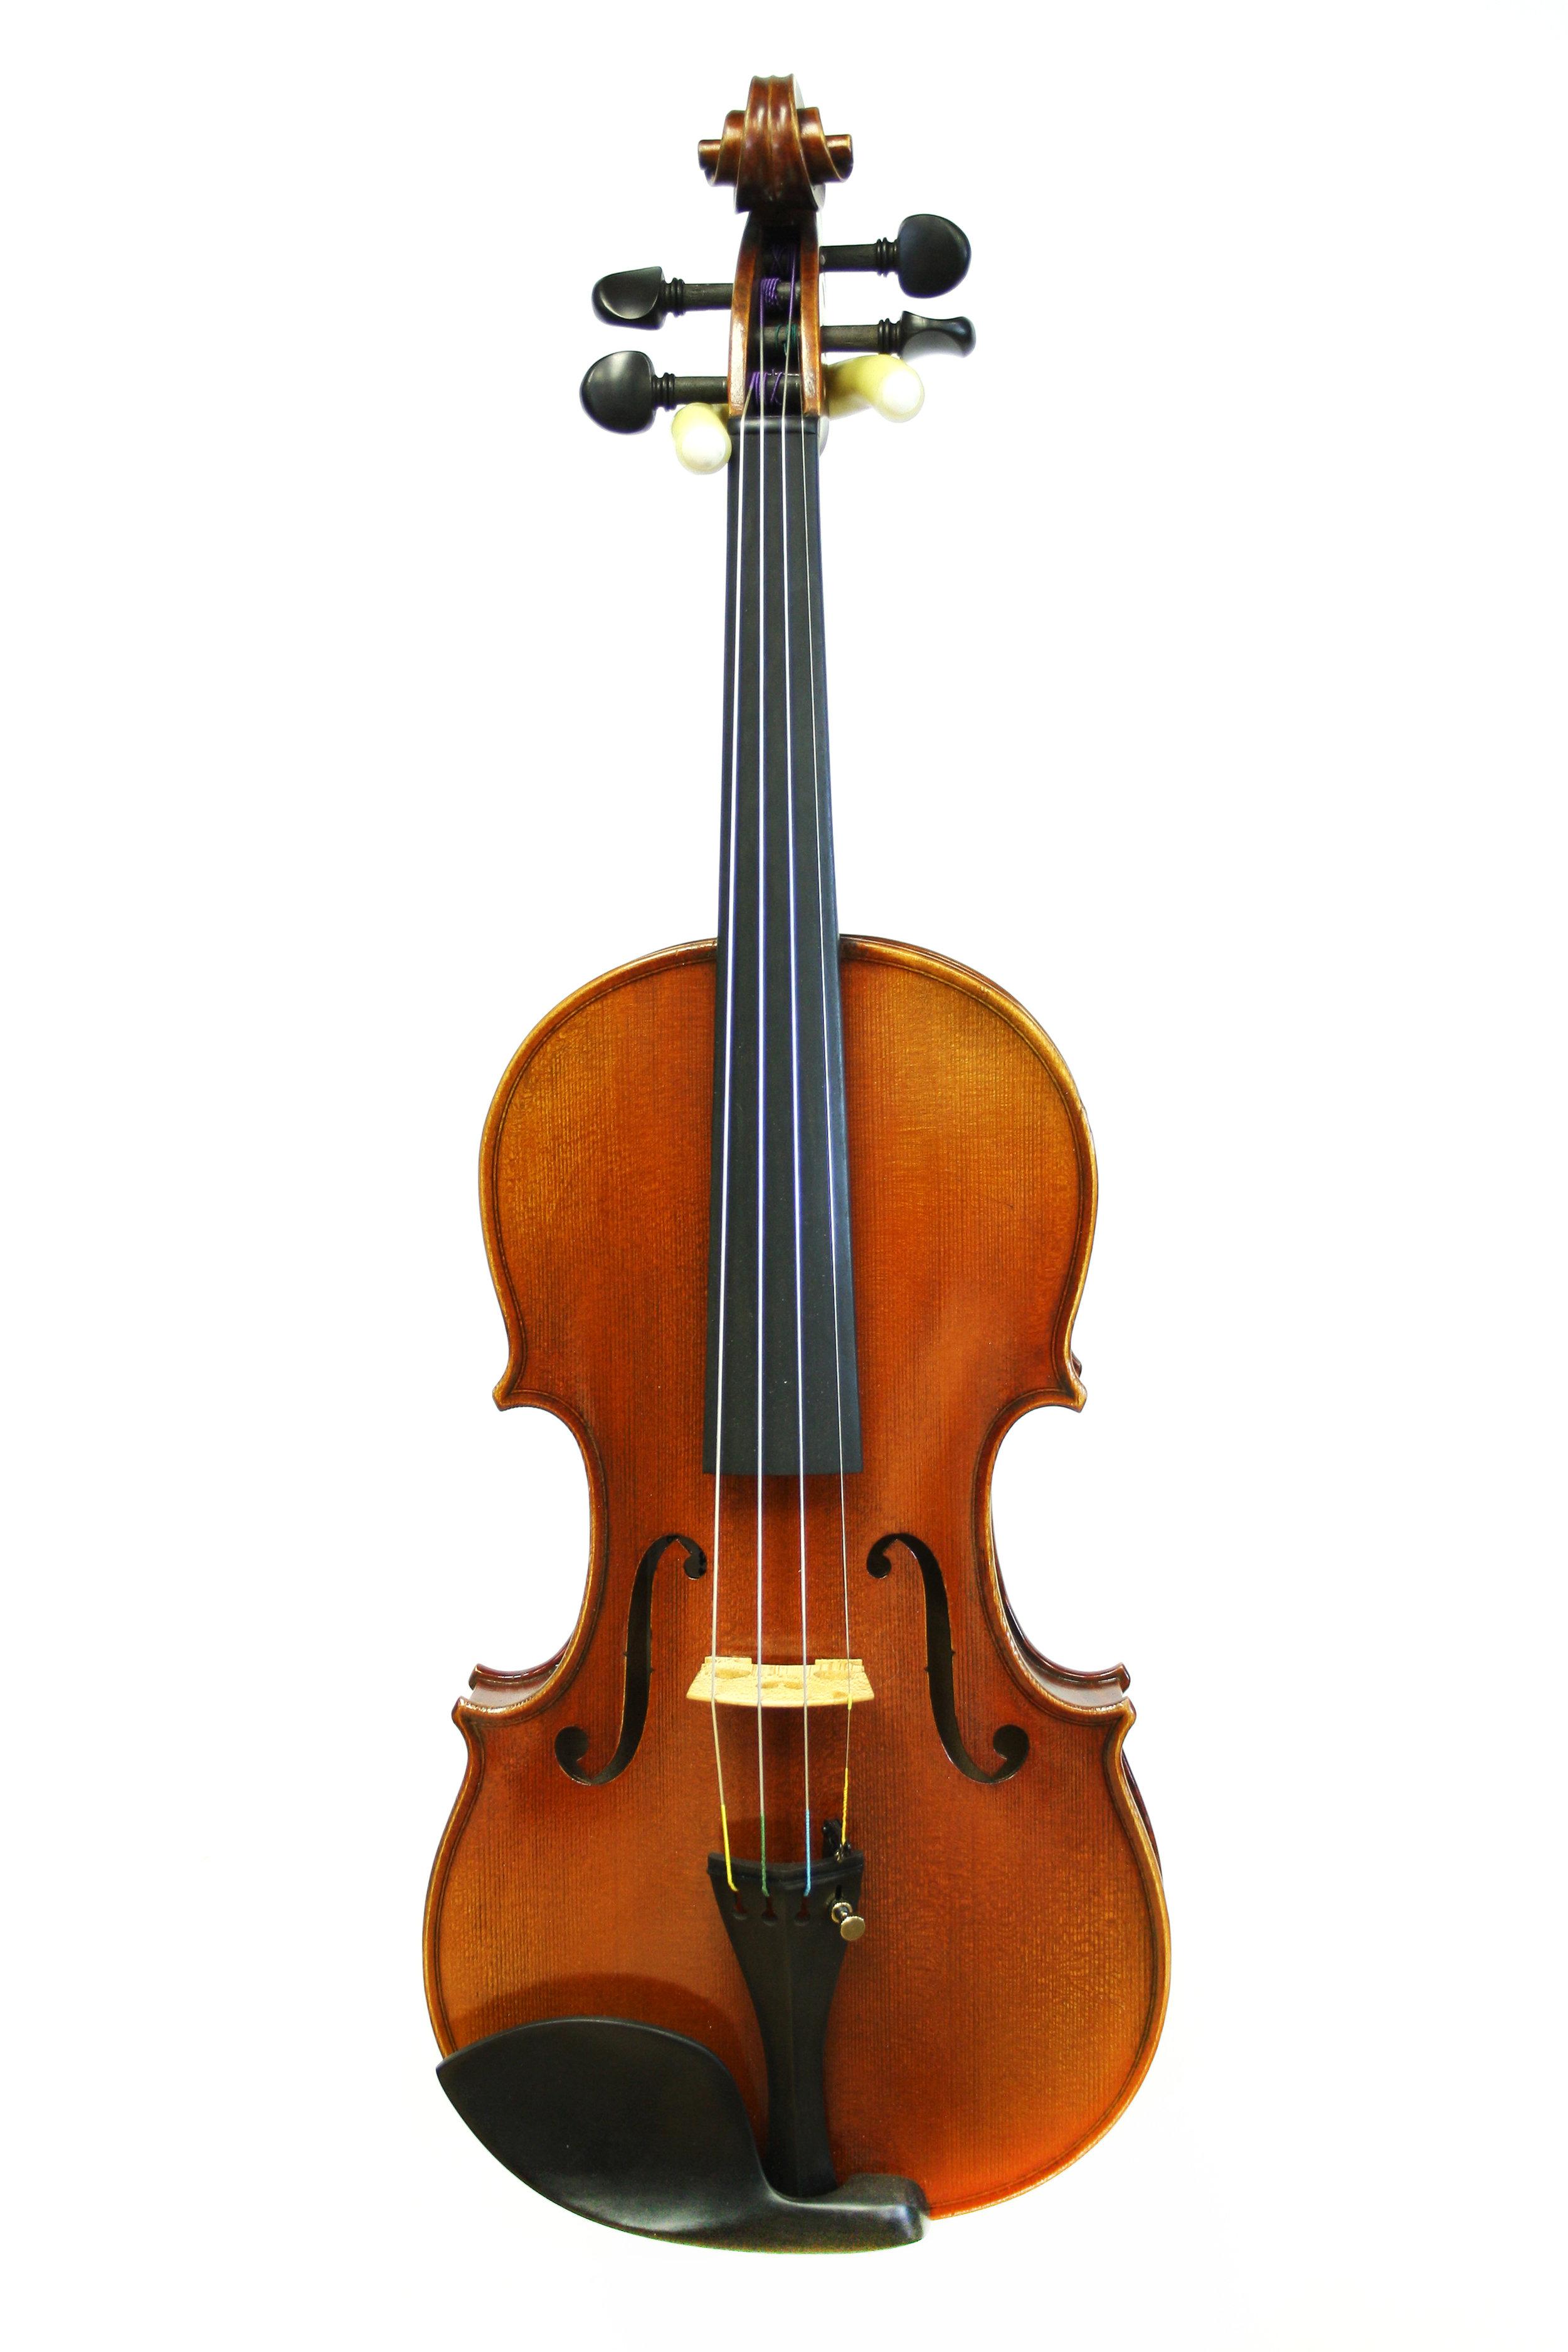 Cedar Strings CB Violin - $1299